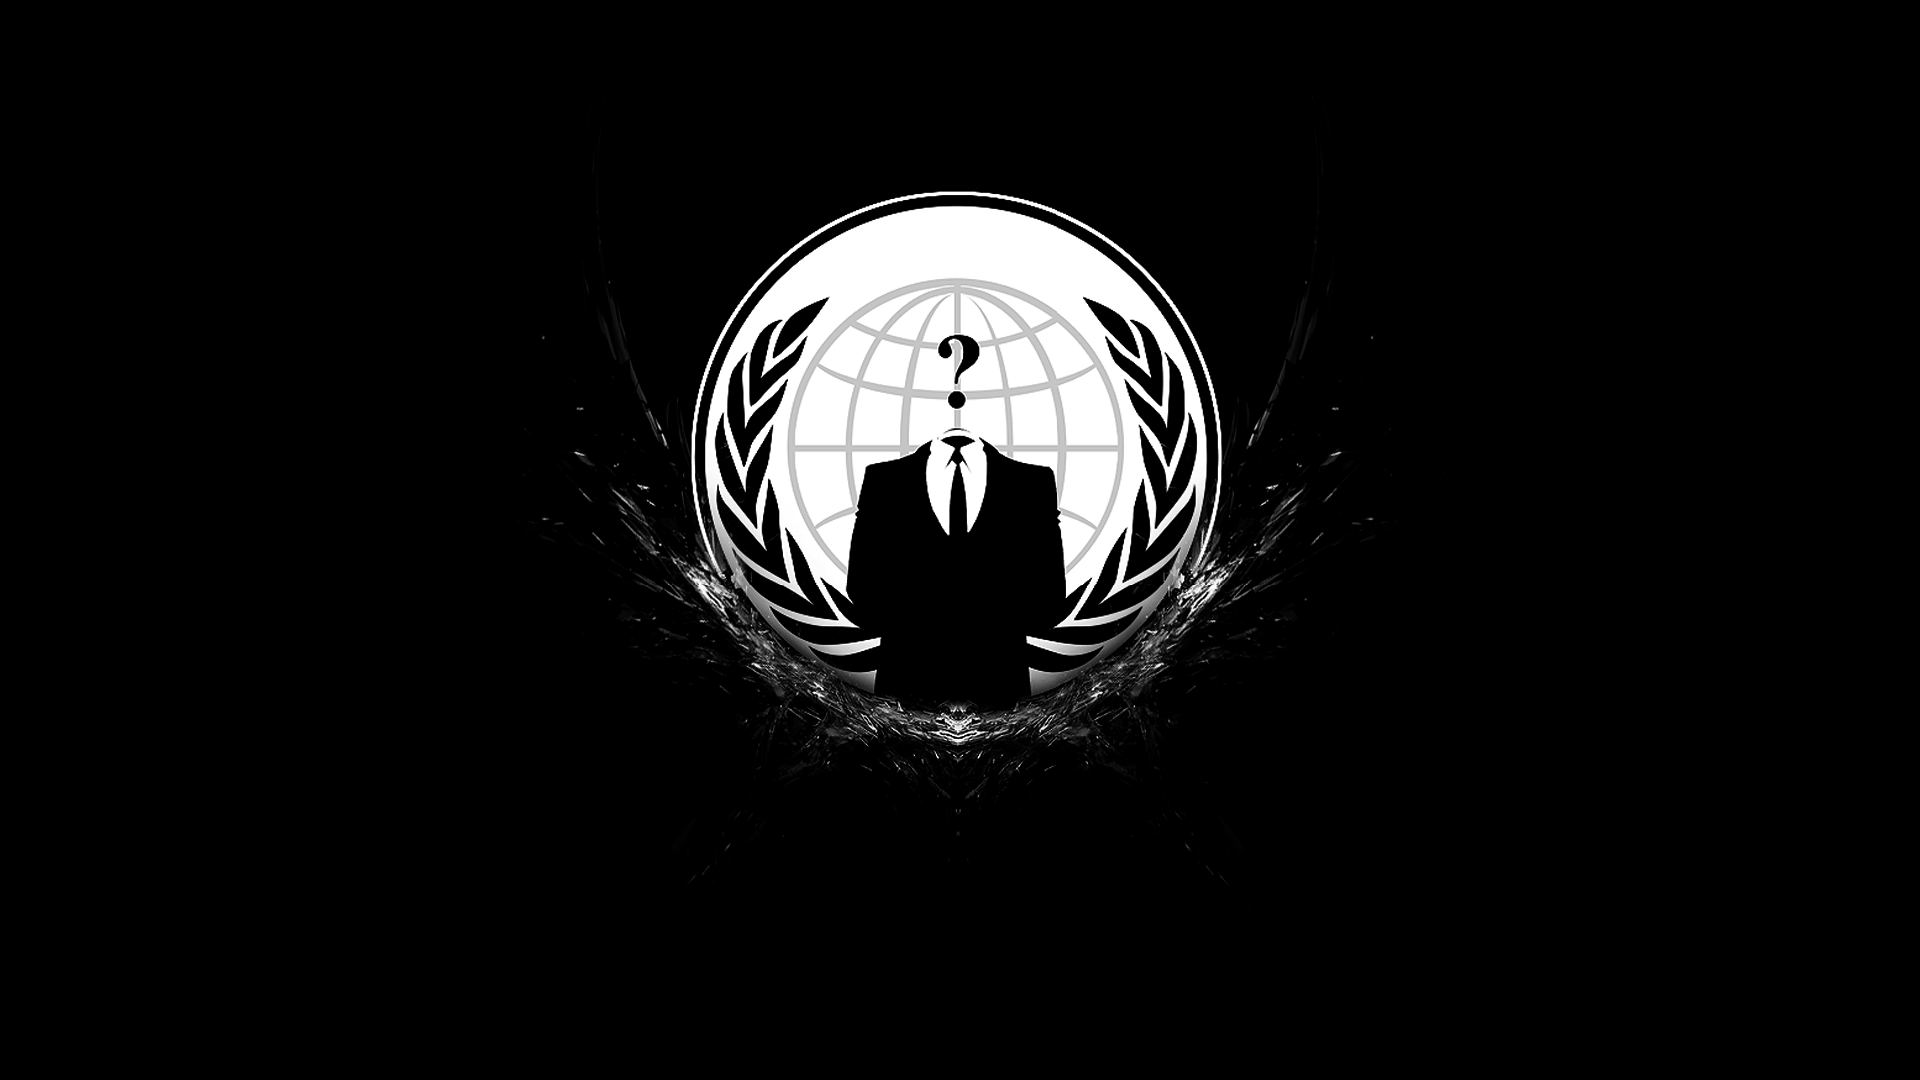 Anonymous hd wallpapers wallpapersafari - Anonymous wallpaper full hd ...